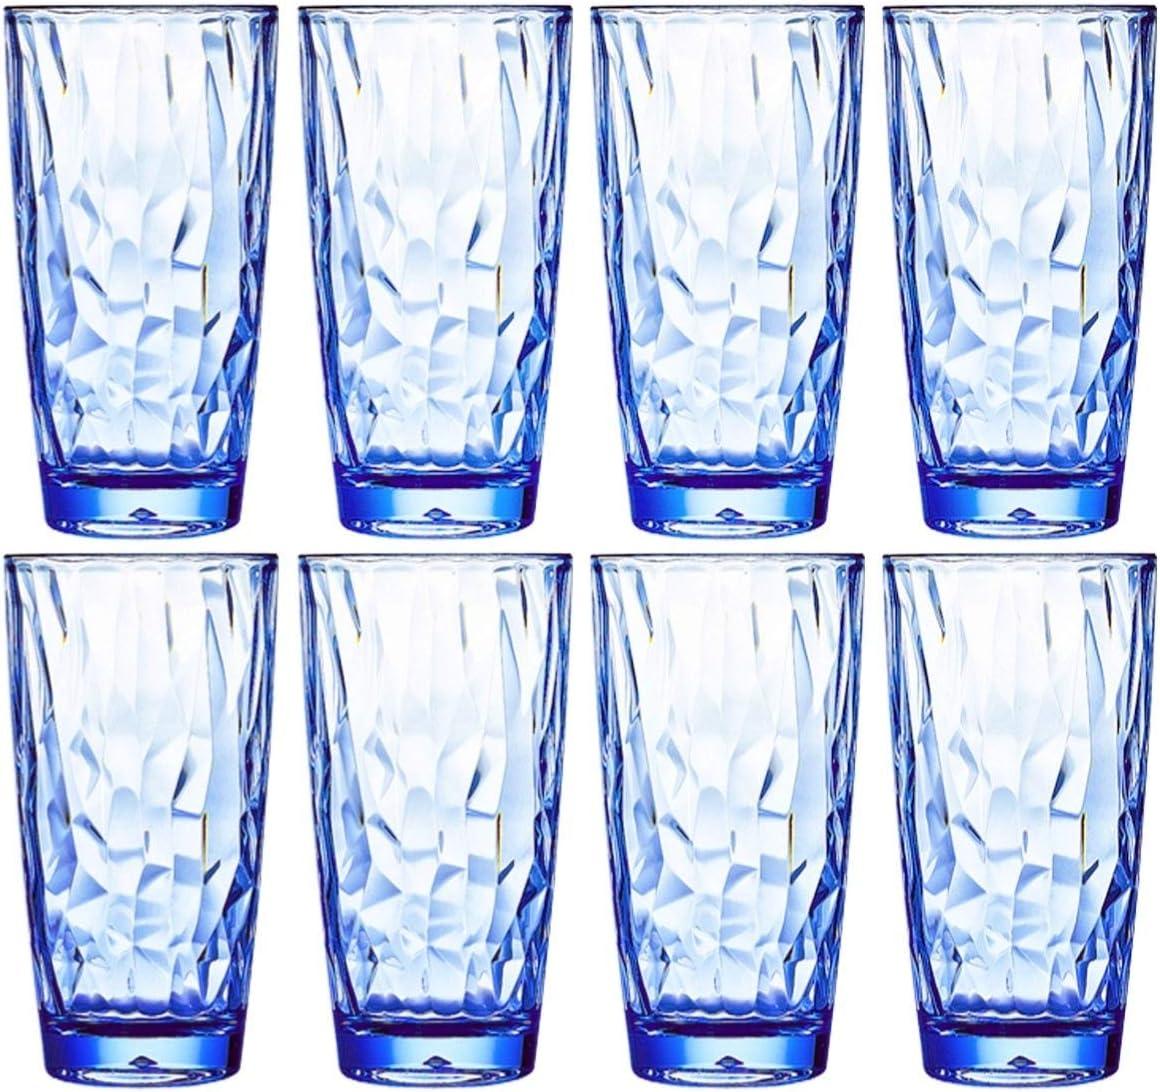 16 Oz 8-Piece Premium Unbreakable Drinking Glasses Plastic Tumblers Dishwasher Safe BPA Free Acrylic Juice Glasses Highball Water Glasses (Blue)